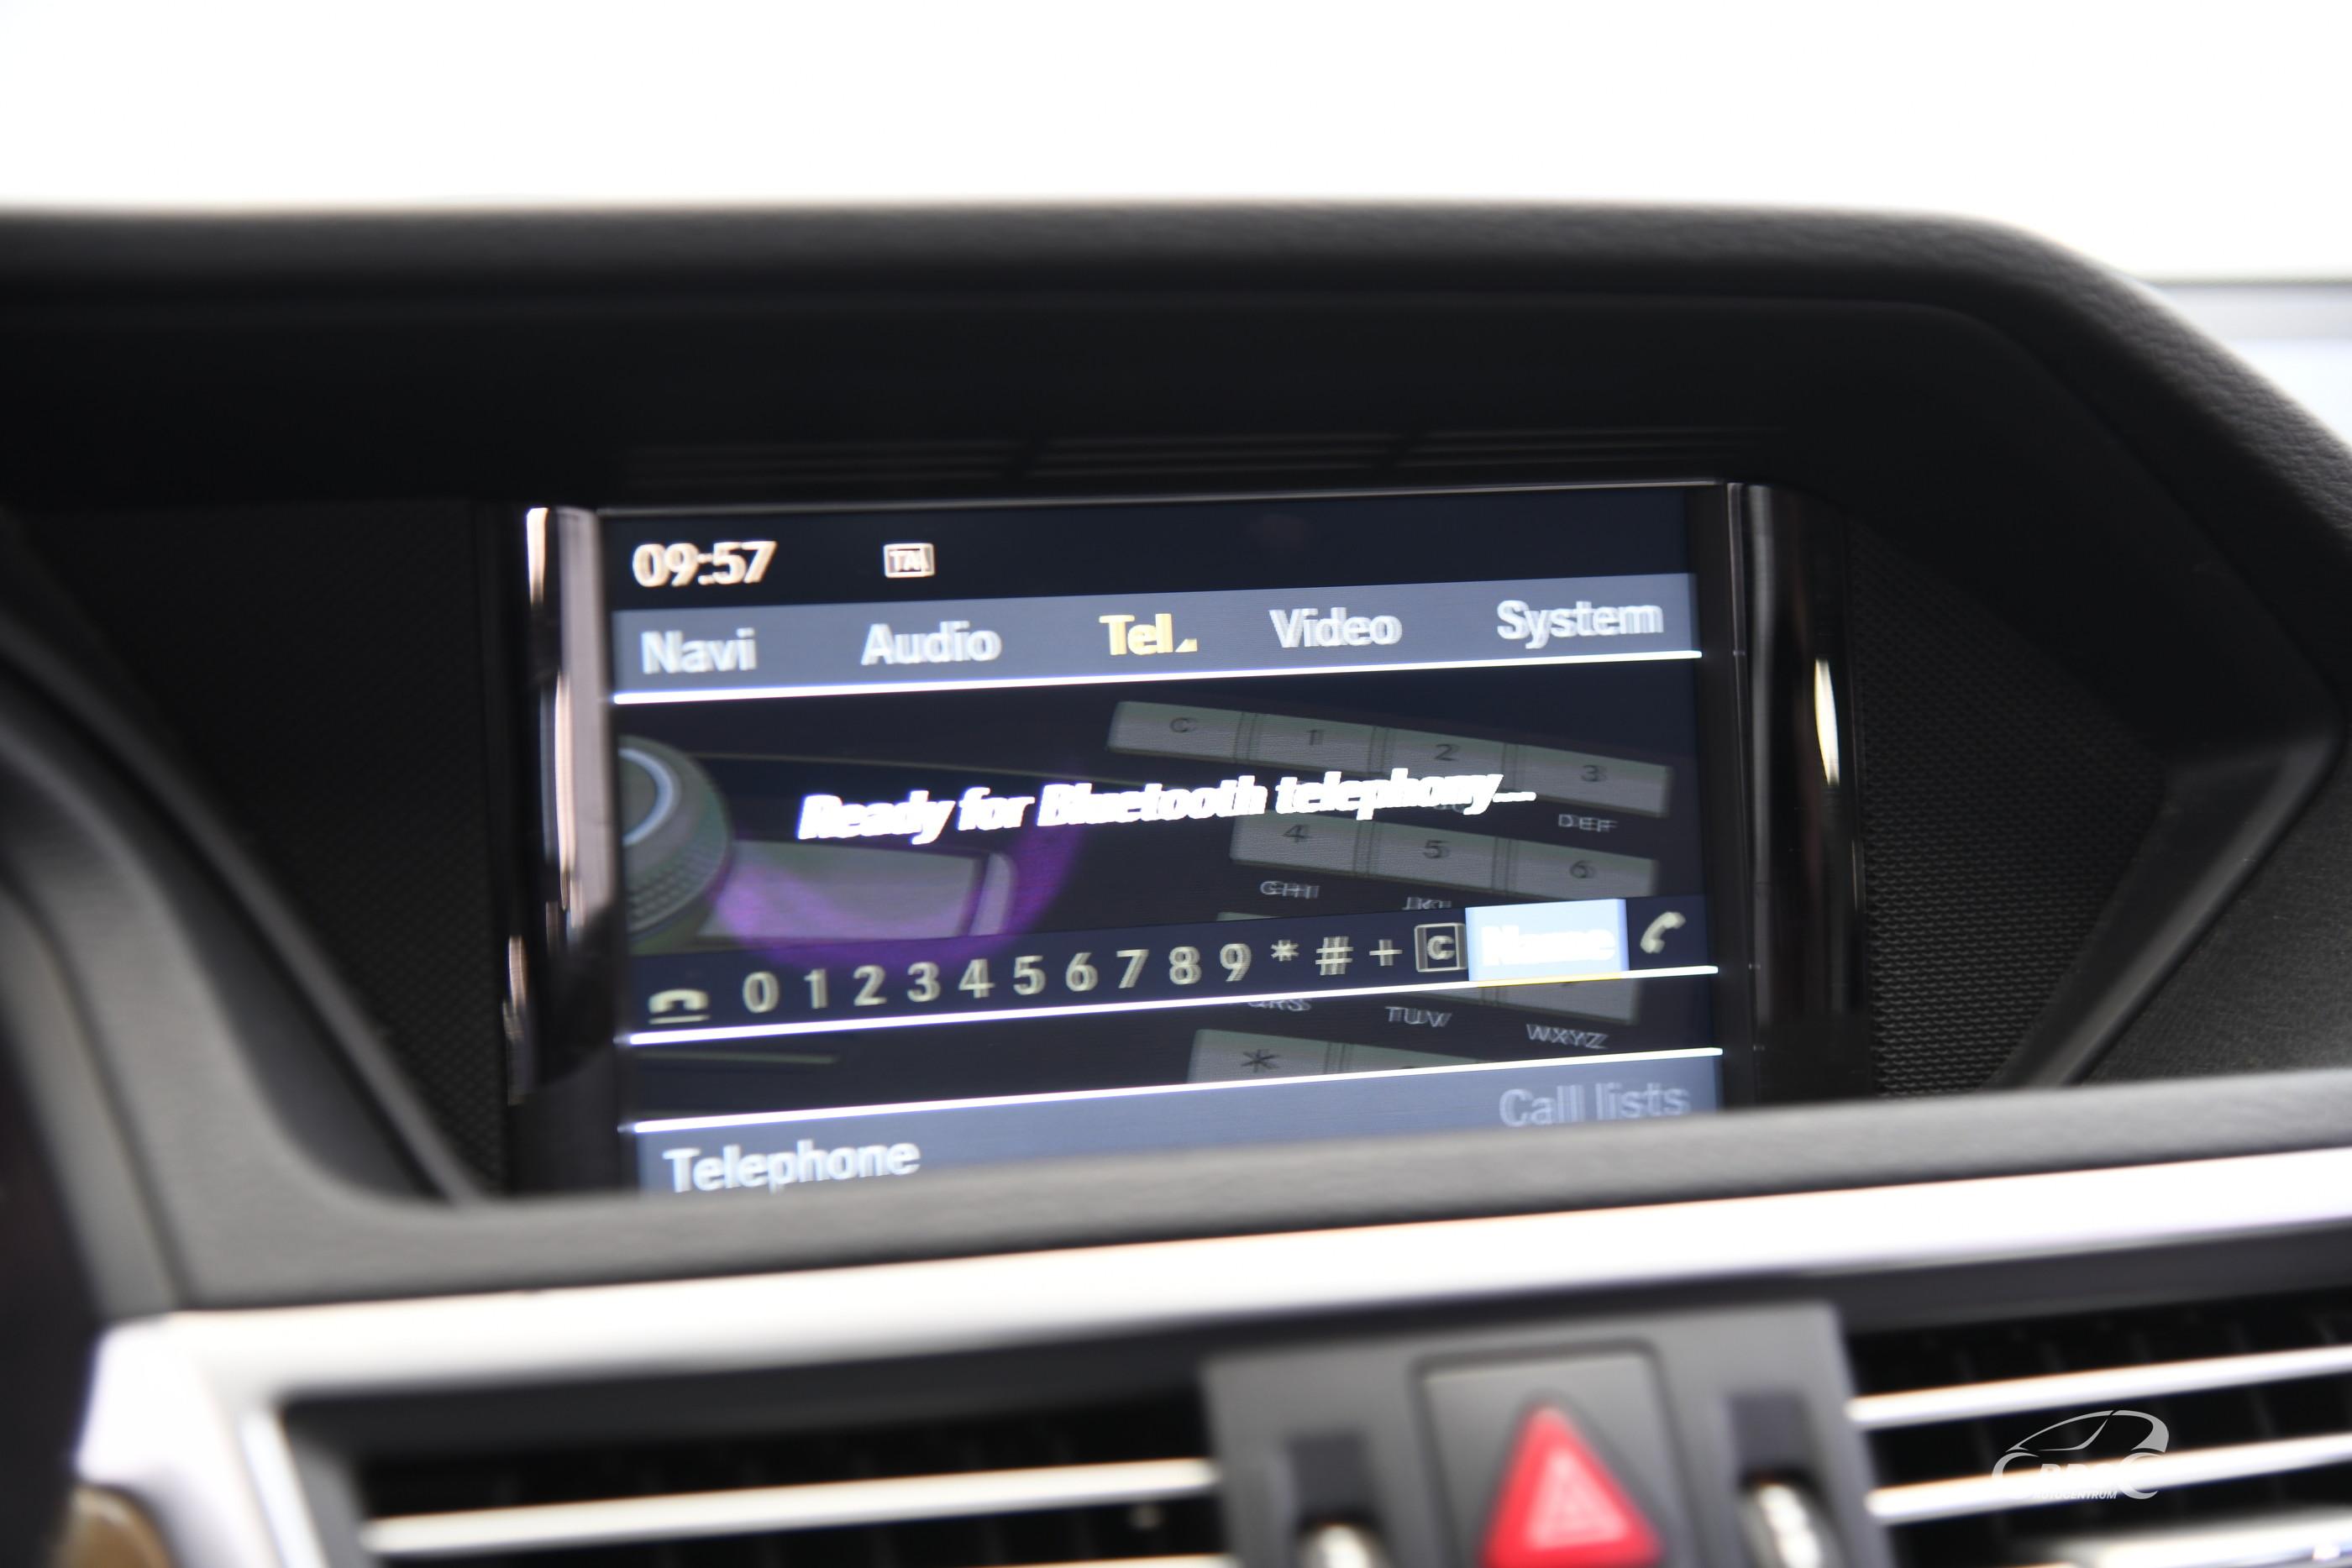 Mercedes-Benz E 220 CDI Elegance BlueEFFICIENCY Automatas